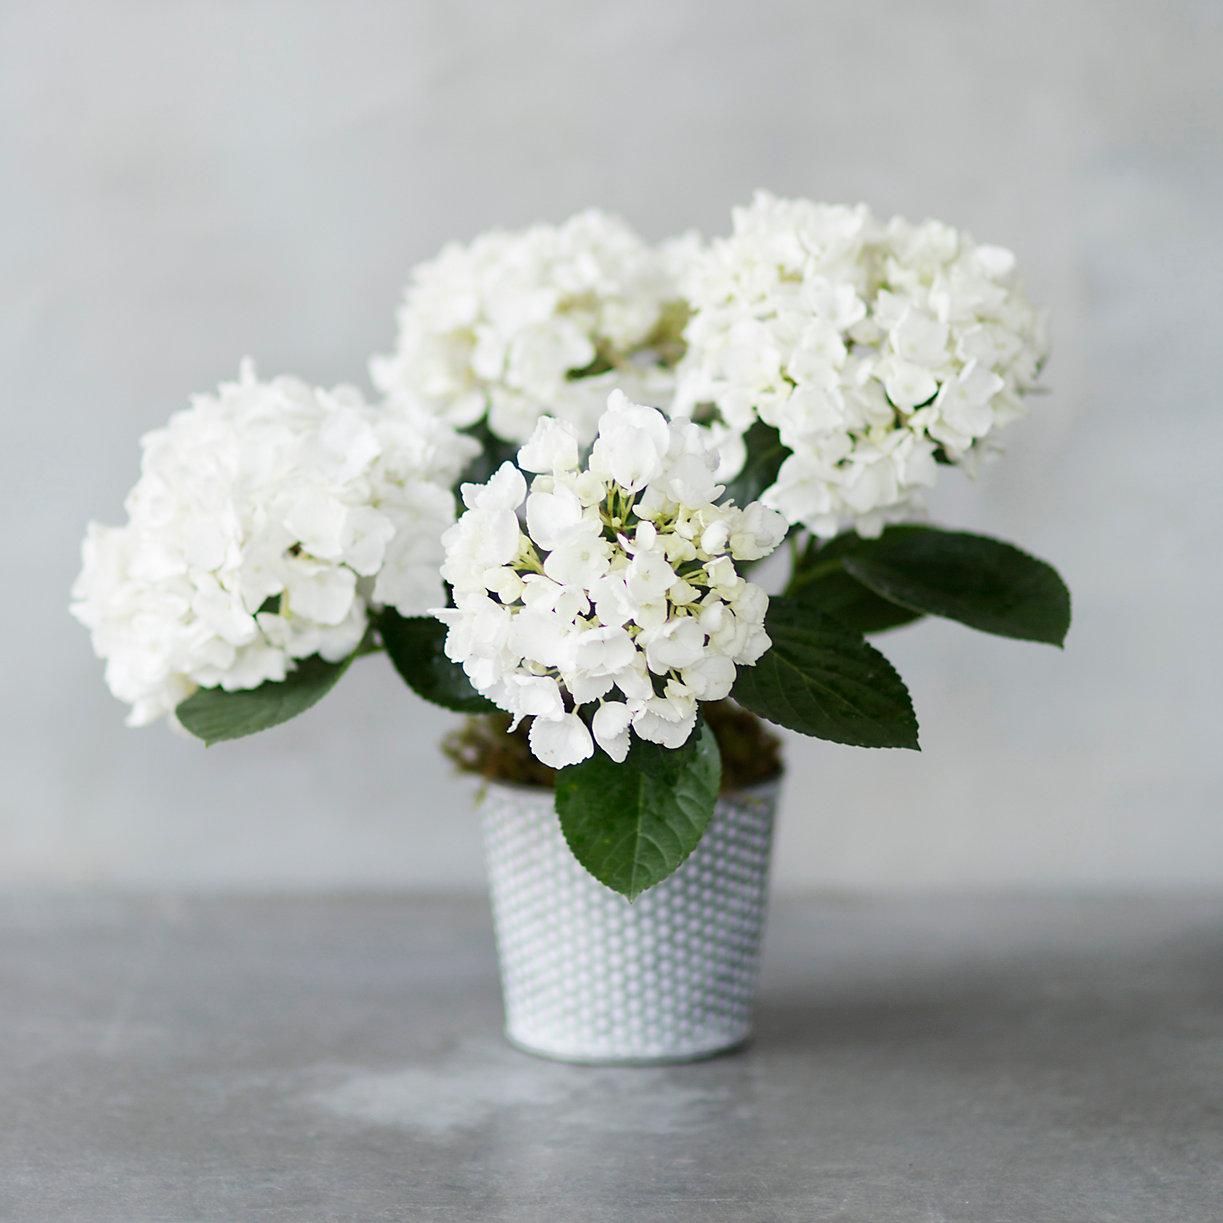 white hydrangea dotted pot loading zoom - White Hydrangea